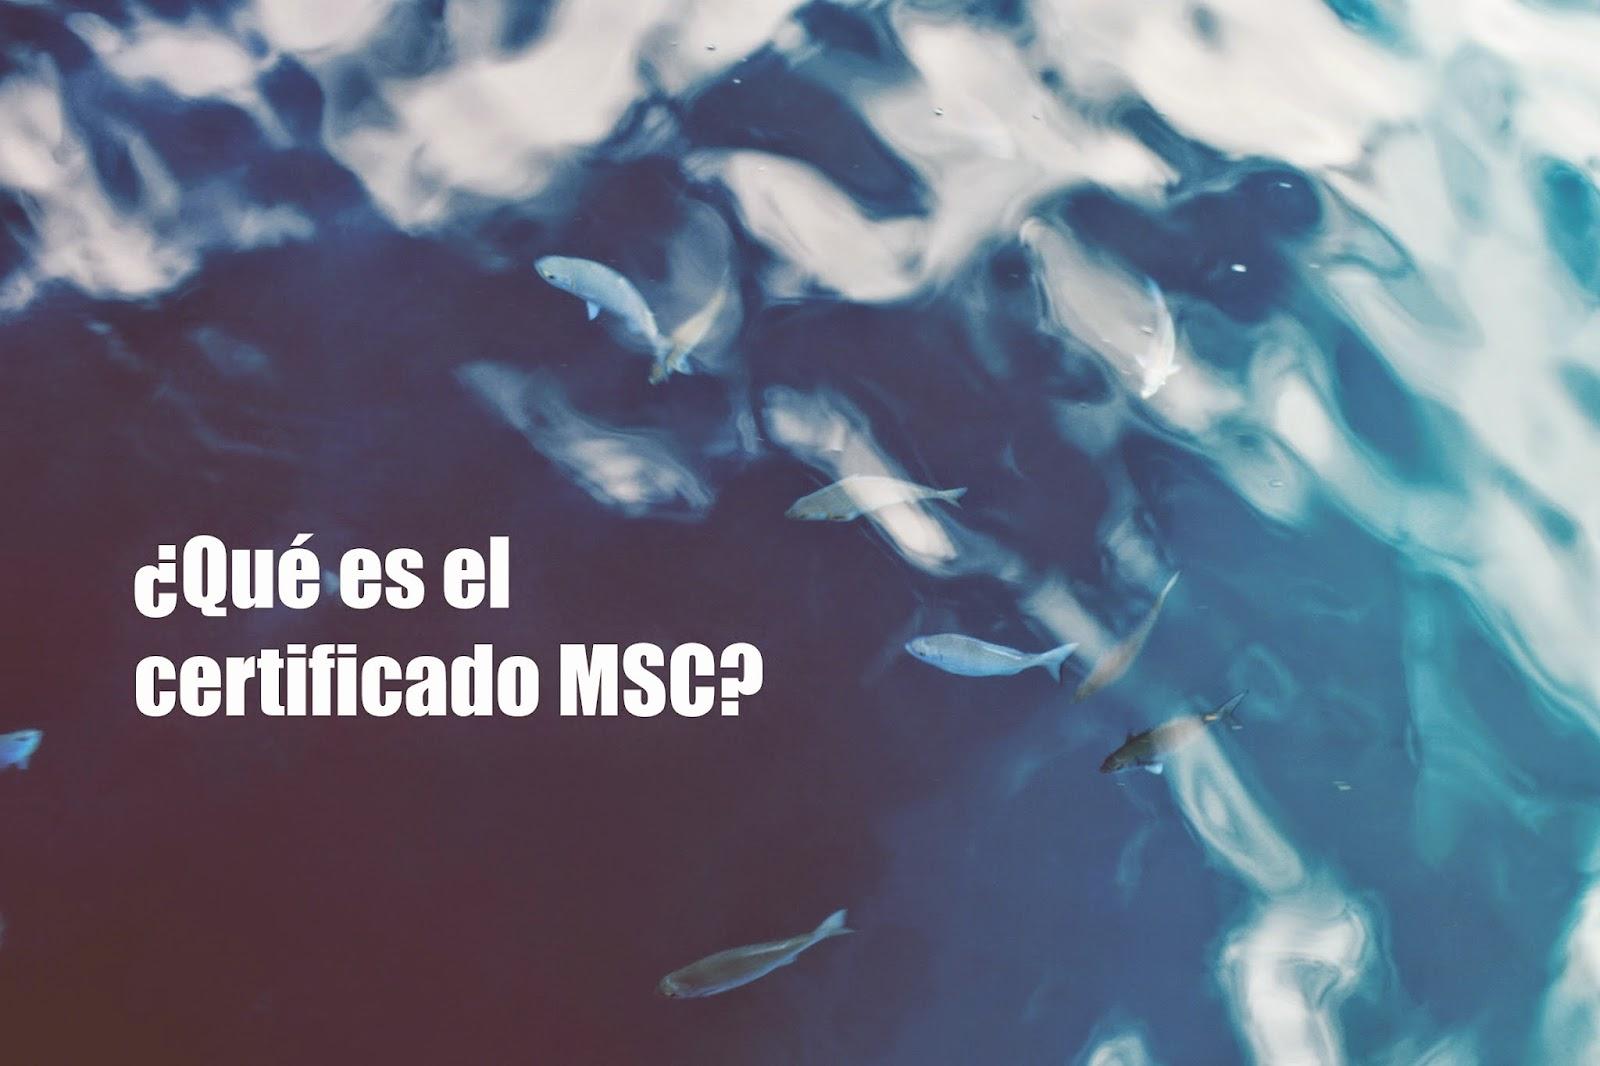 certificado msc